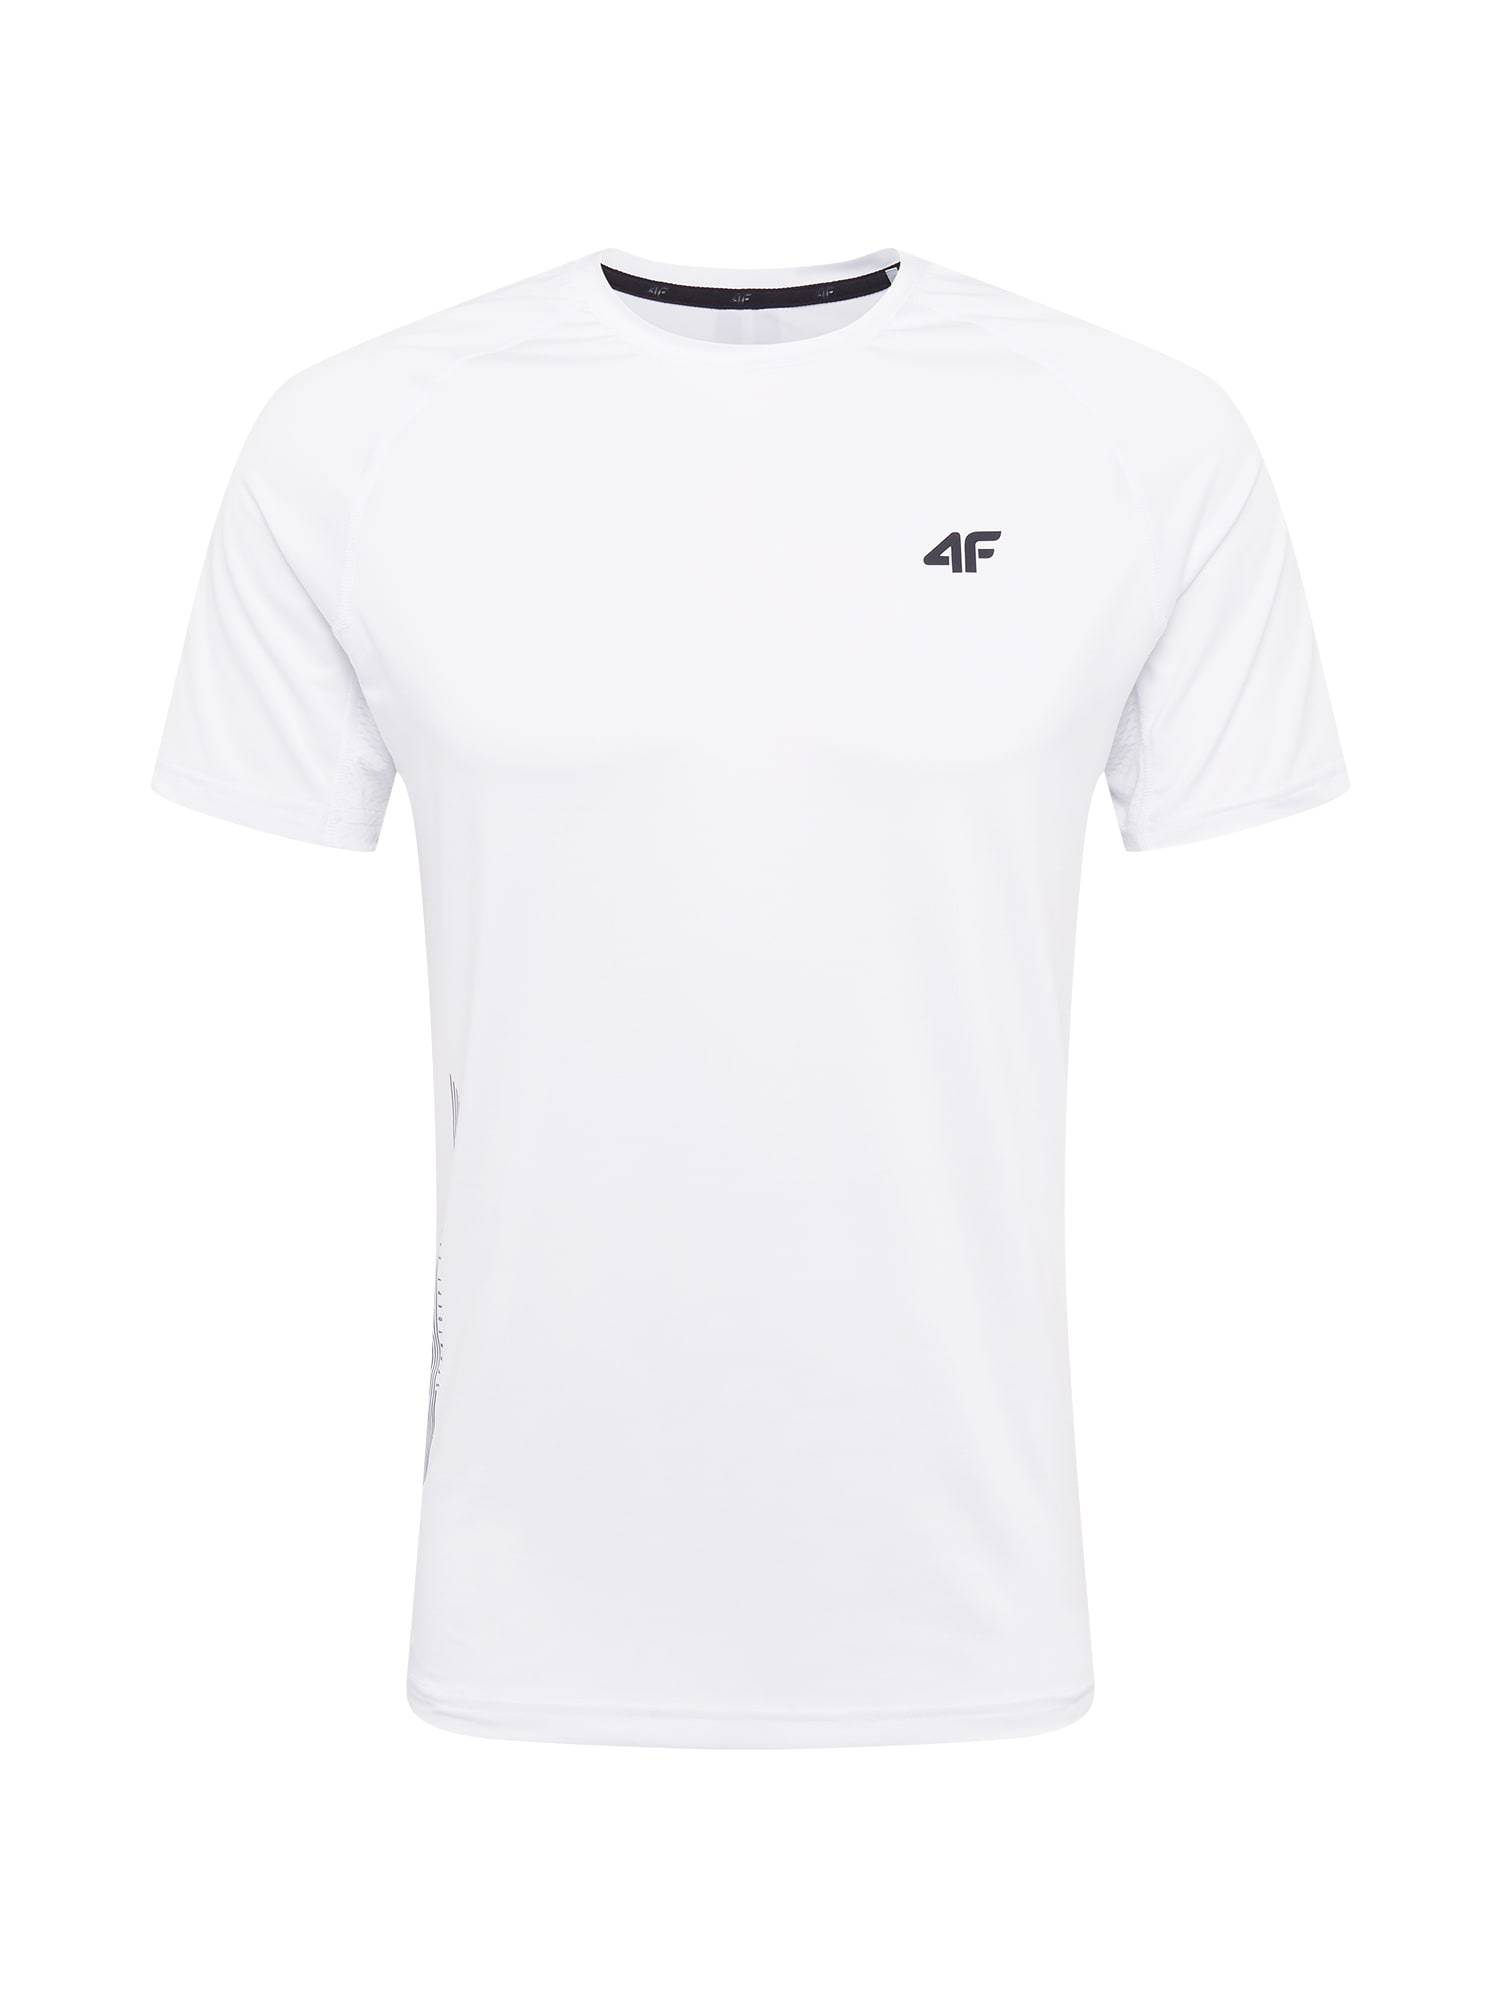 4F T-Shirt fonctionnel  - Blanc - Taille: XXL - male